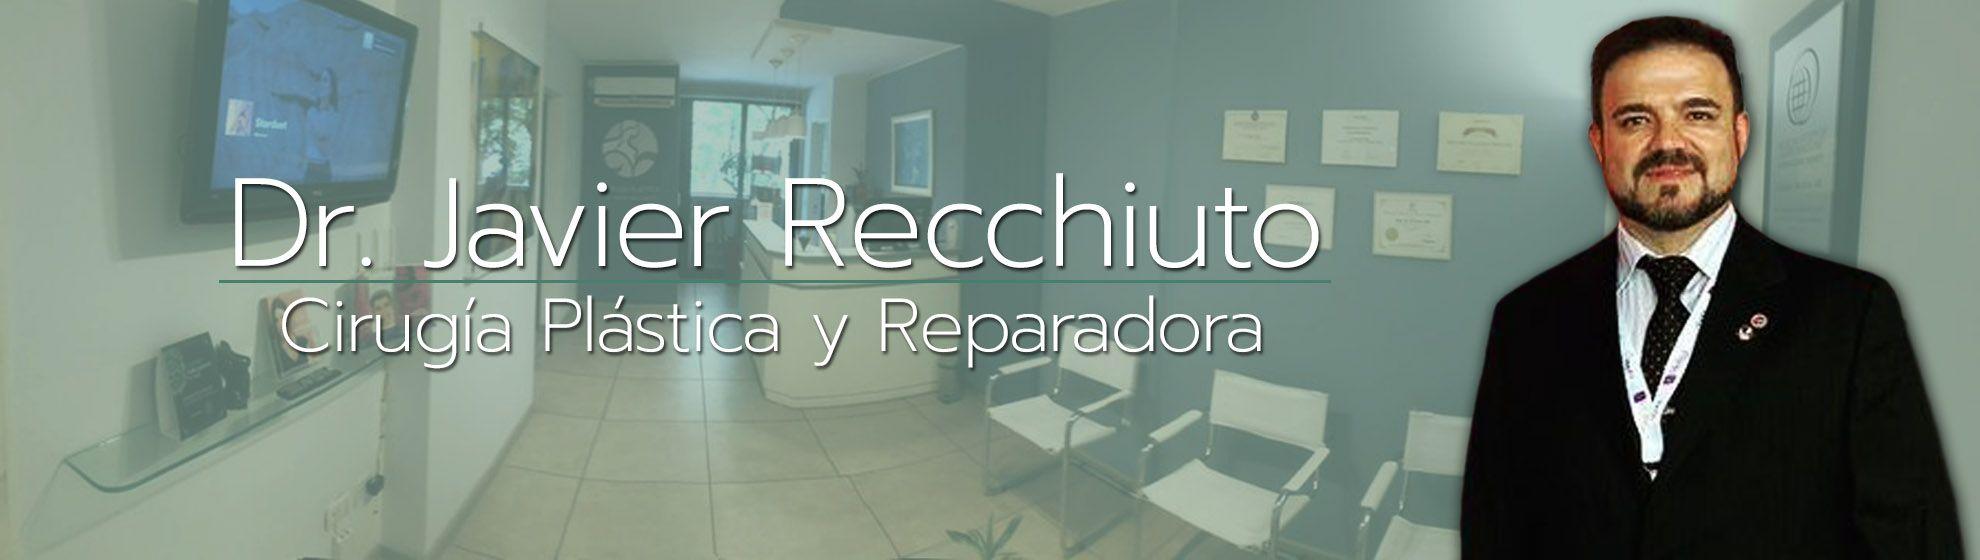 Dr. Javier Recchiuto